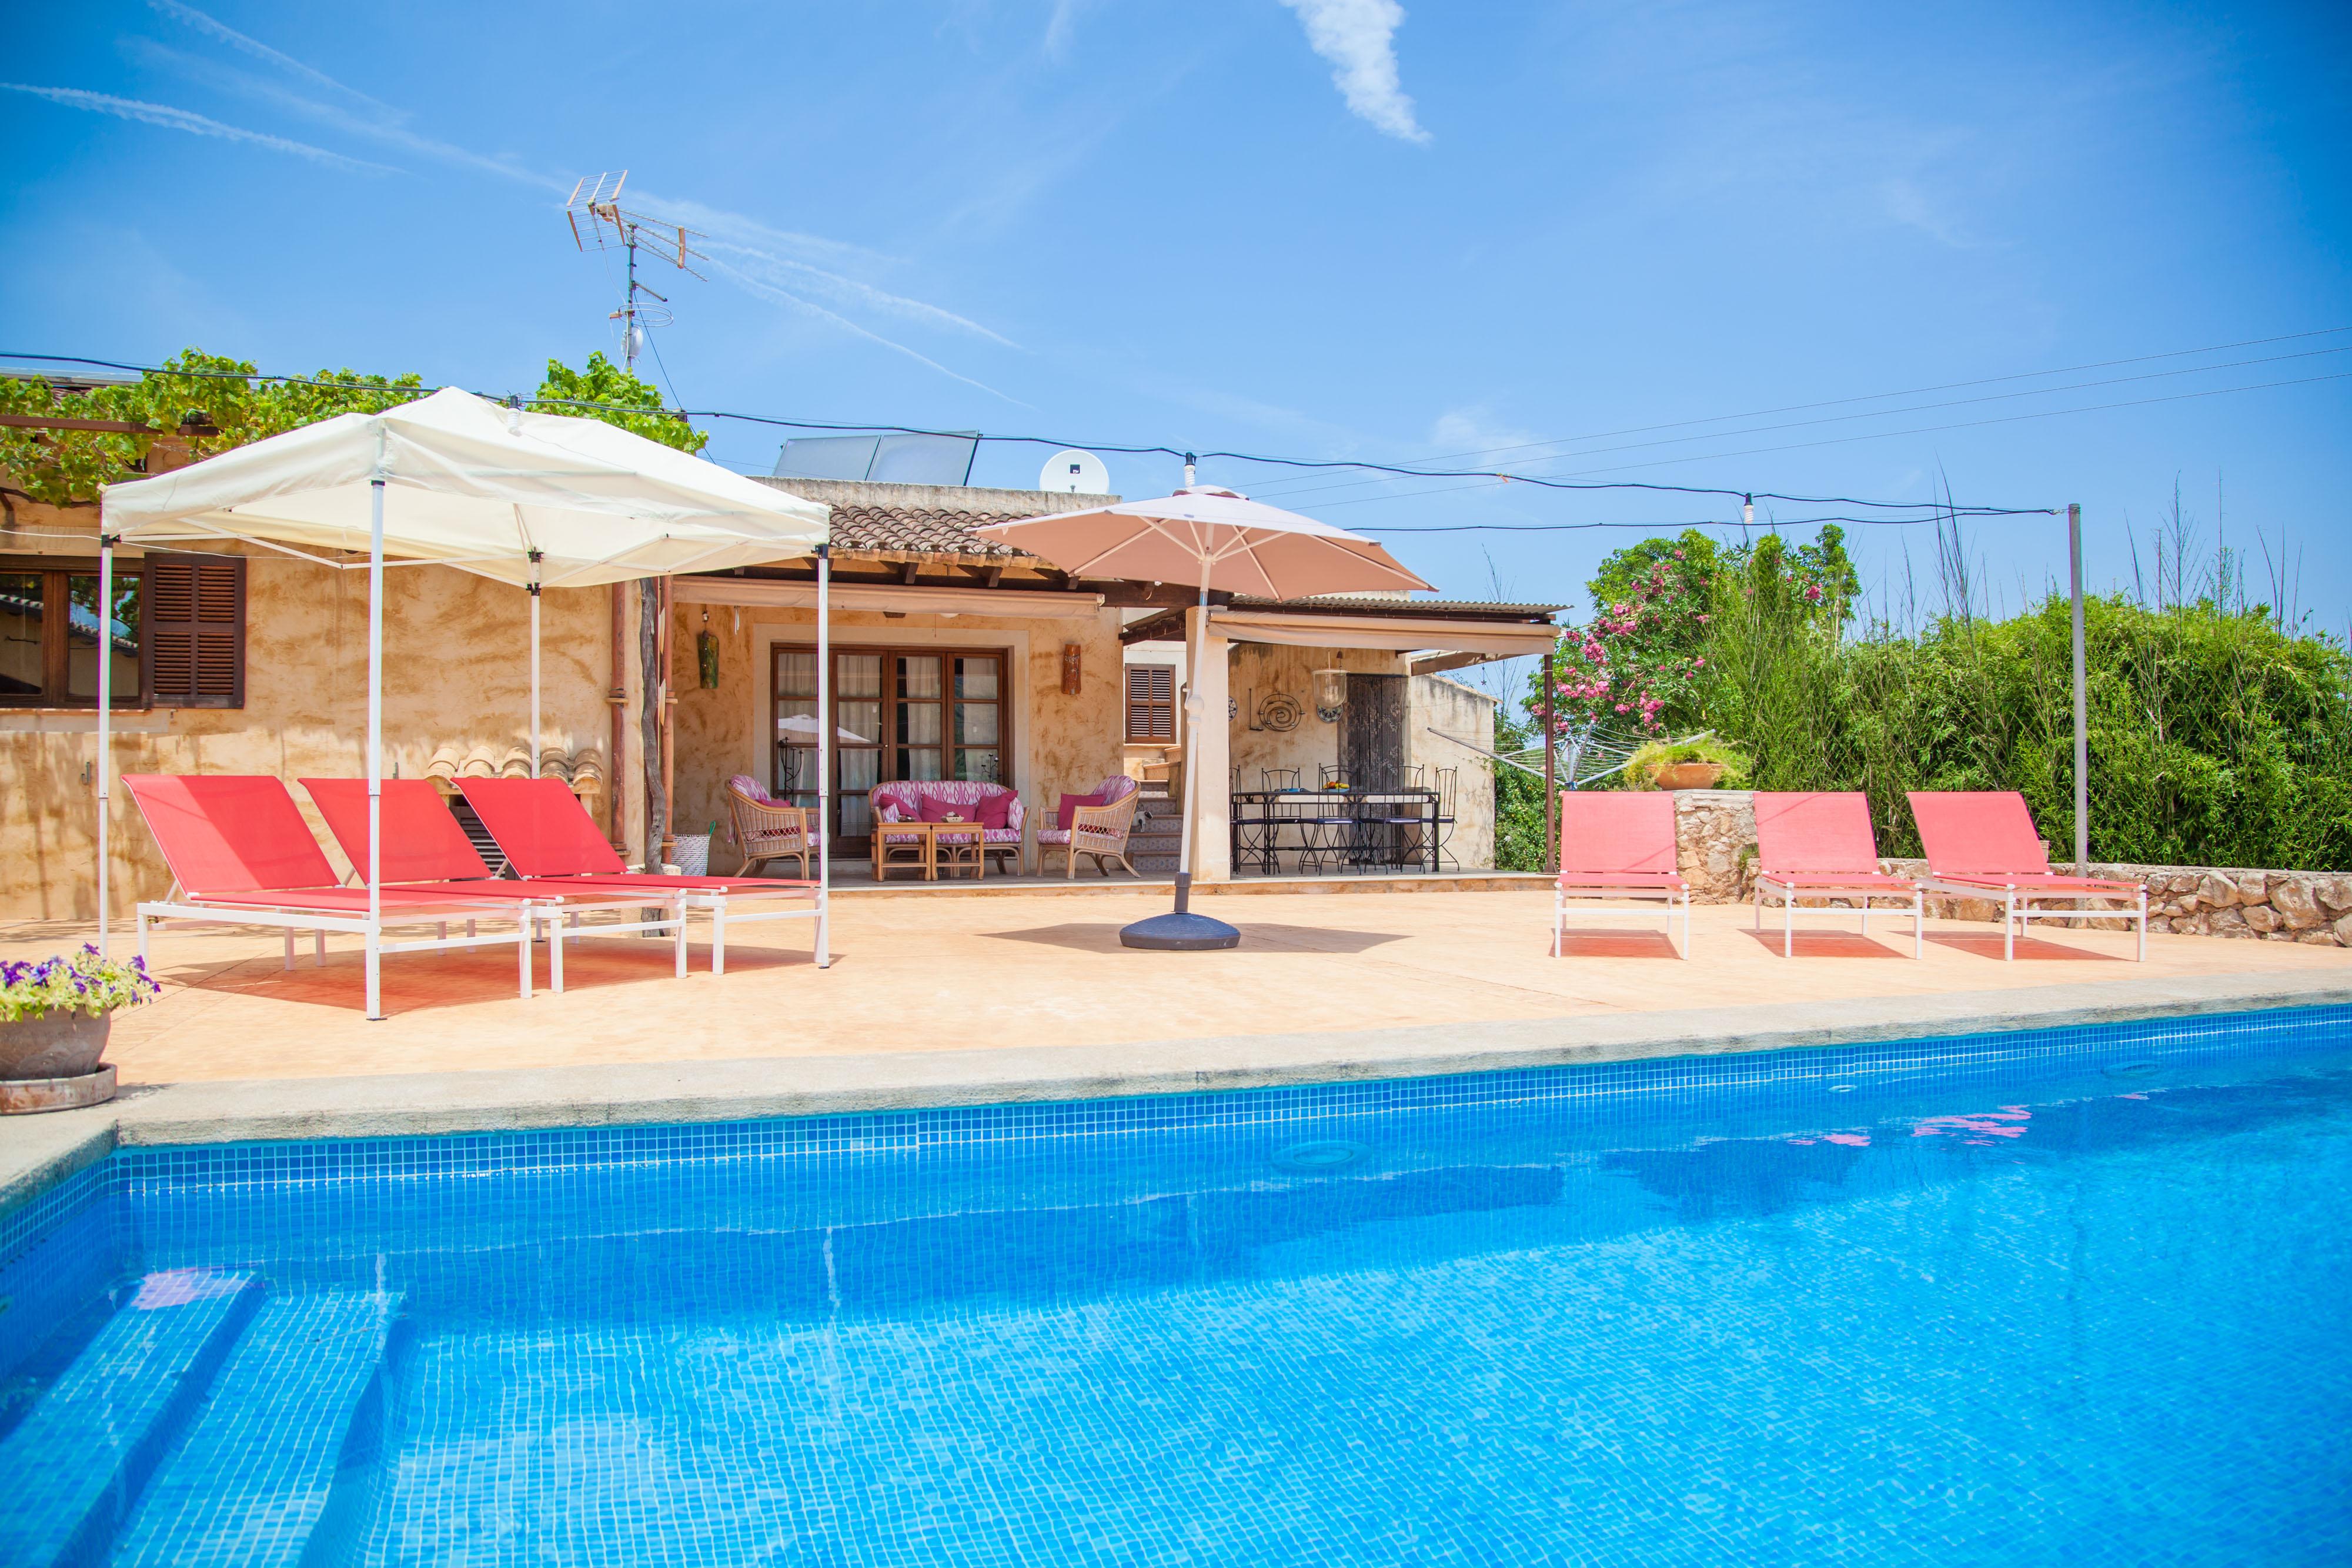 Ferienhaus SA CORBAIA (2020559), Arta, Mallorca, Balearische Inseln, Spanien, Bild 3